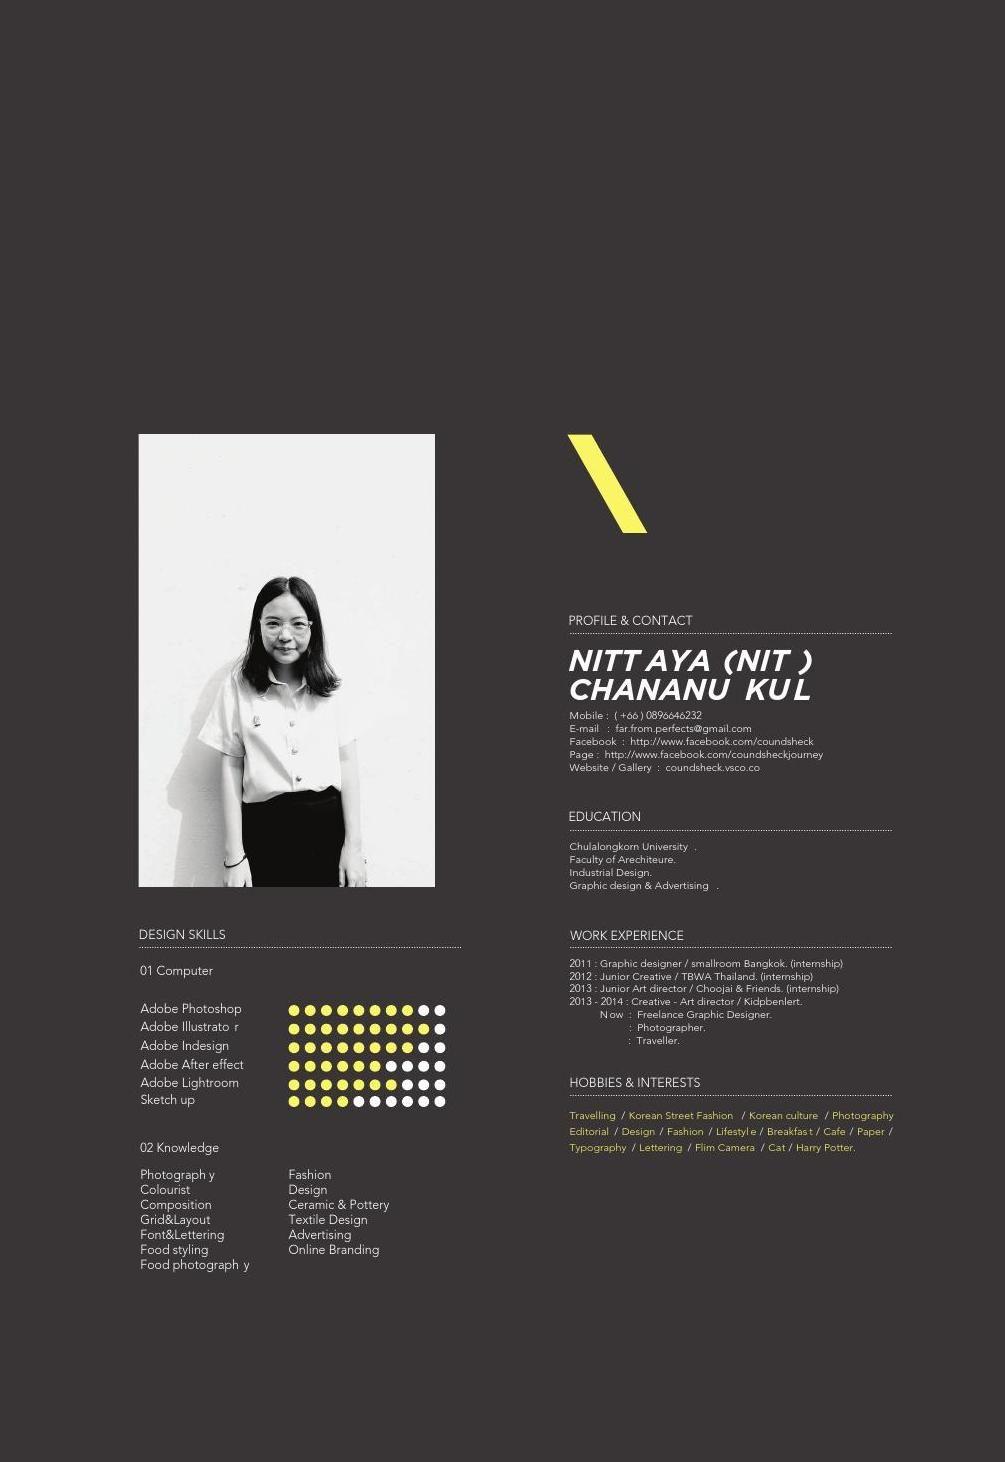 Nittaya S Portfolio For Ceci Portfolio Design Lookbook Layout